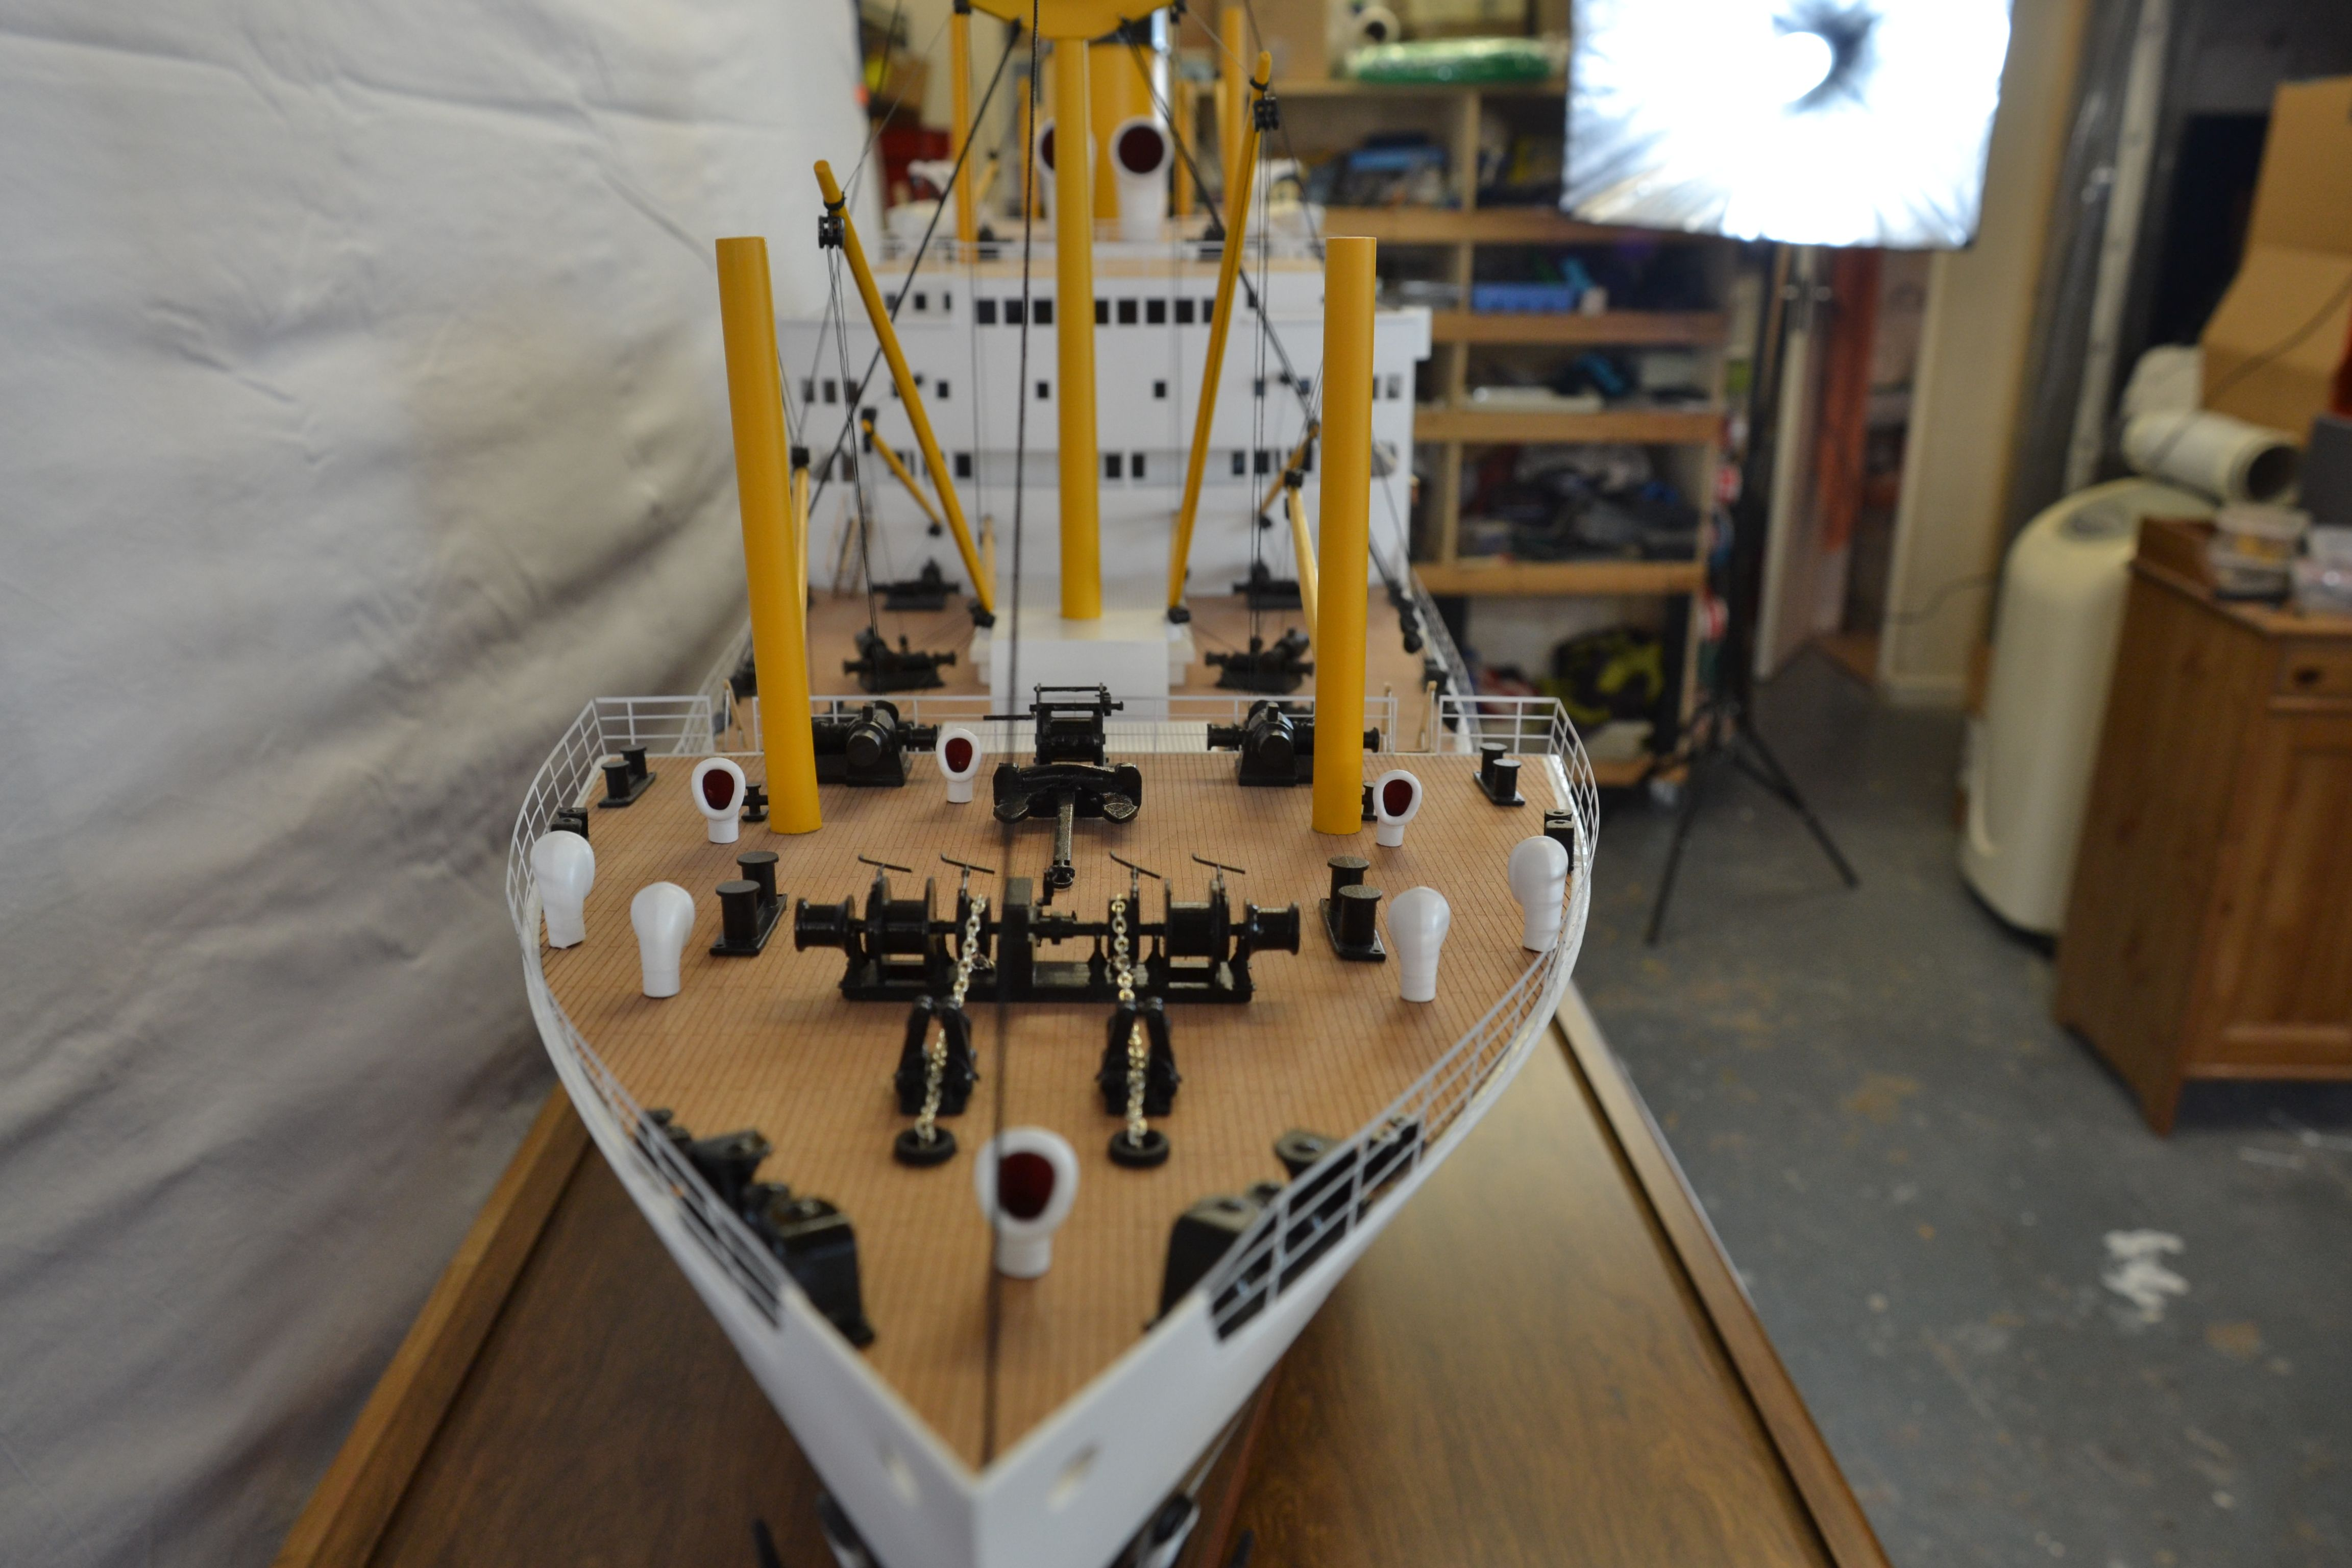 2209-12973-SS-Corinthic-Model-Ship